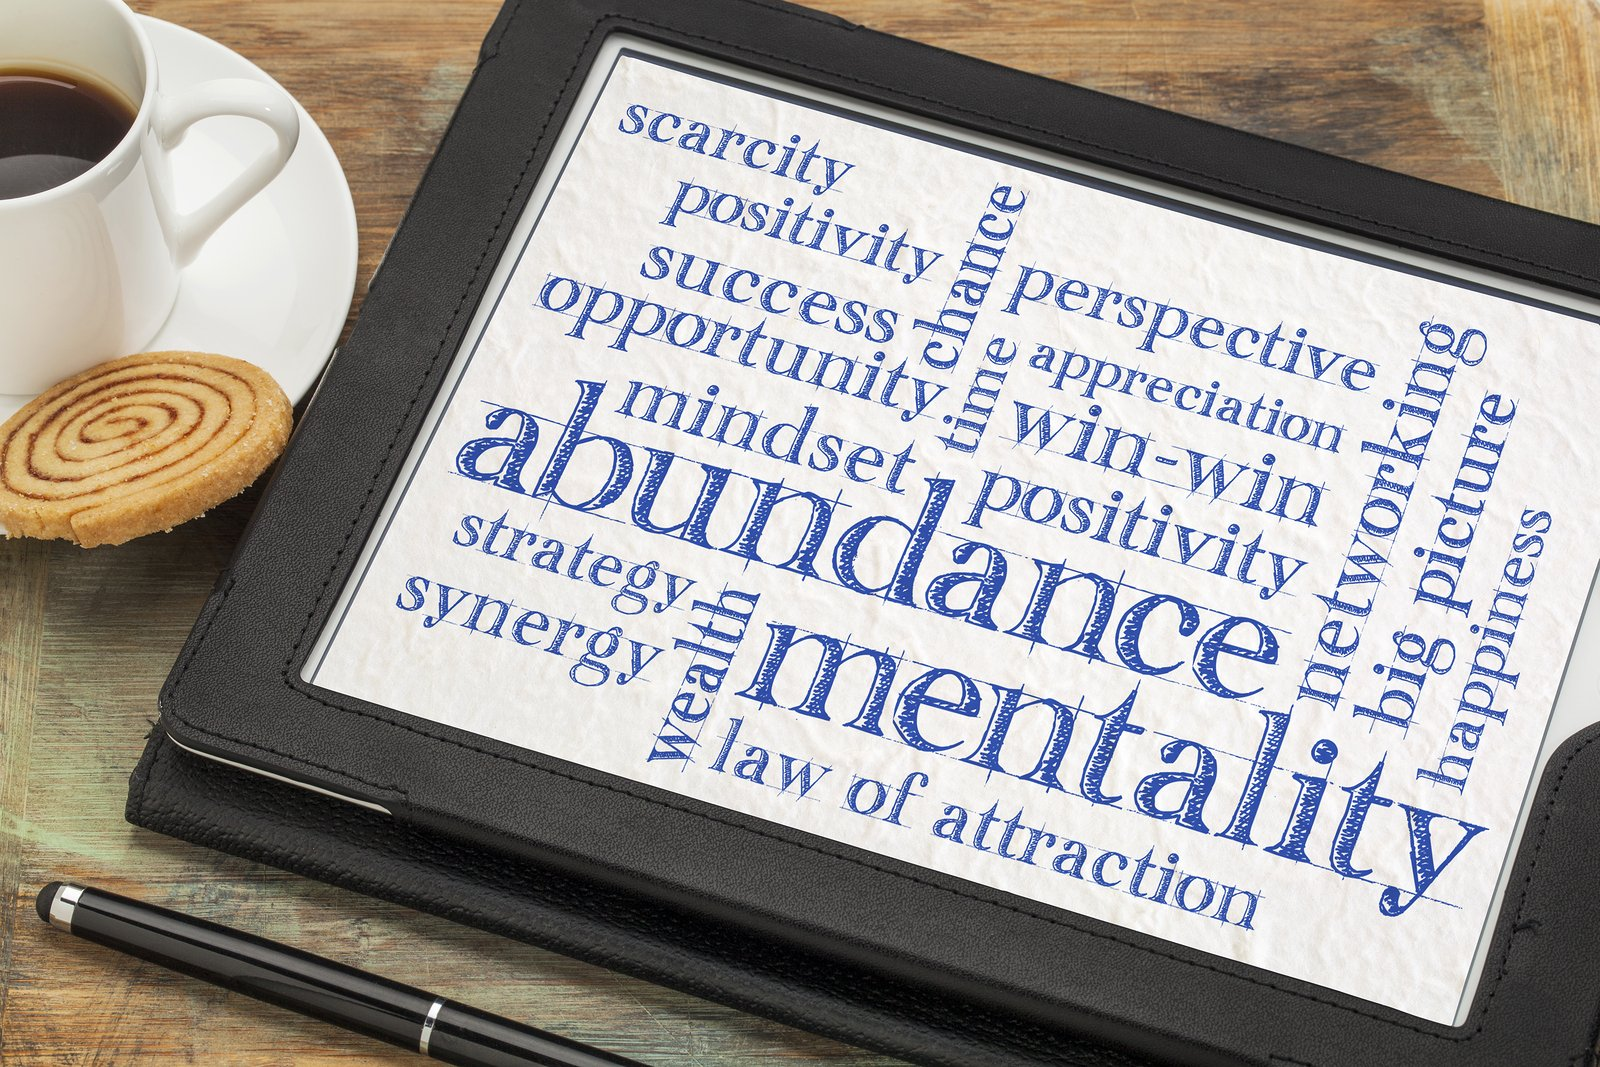 Tips to Create An Abundance Mindset